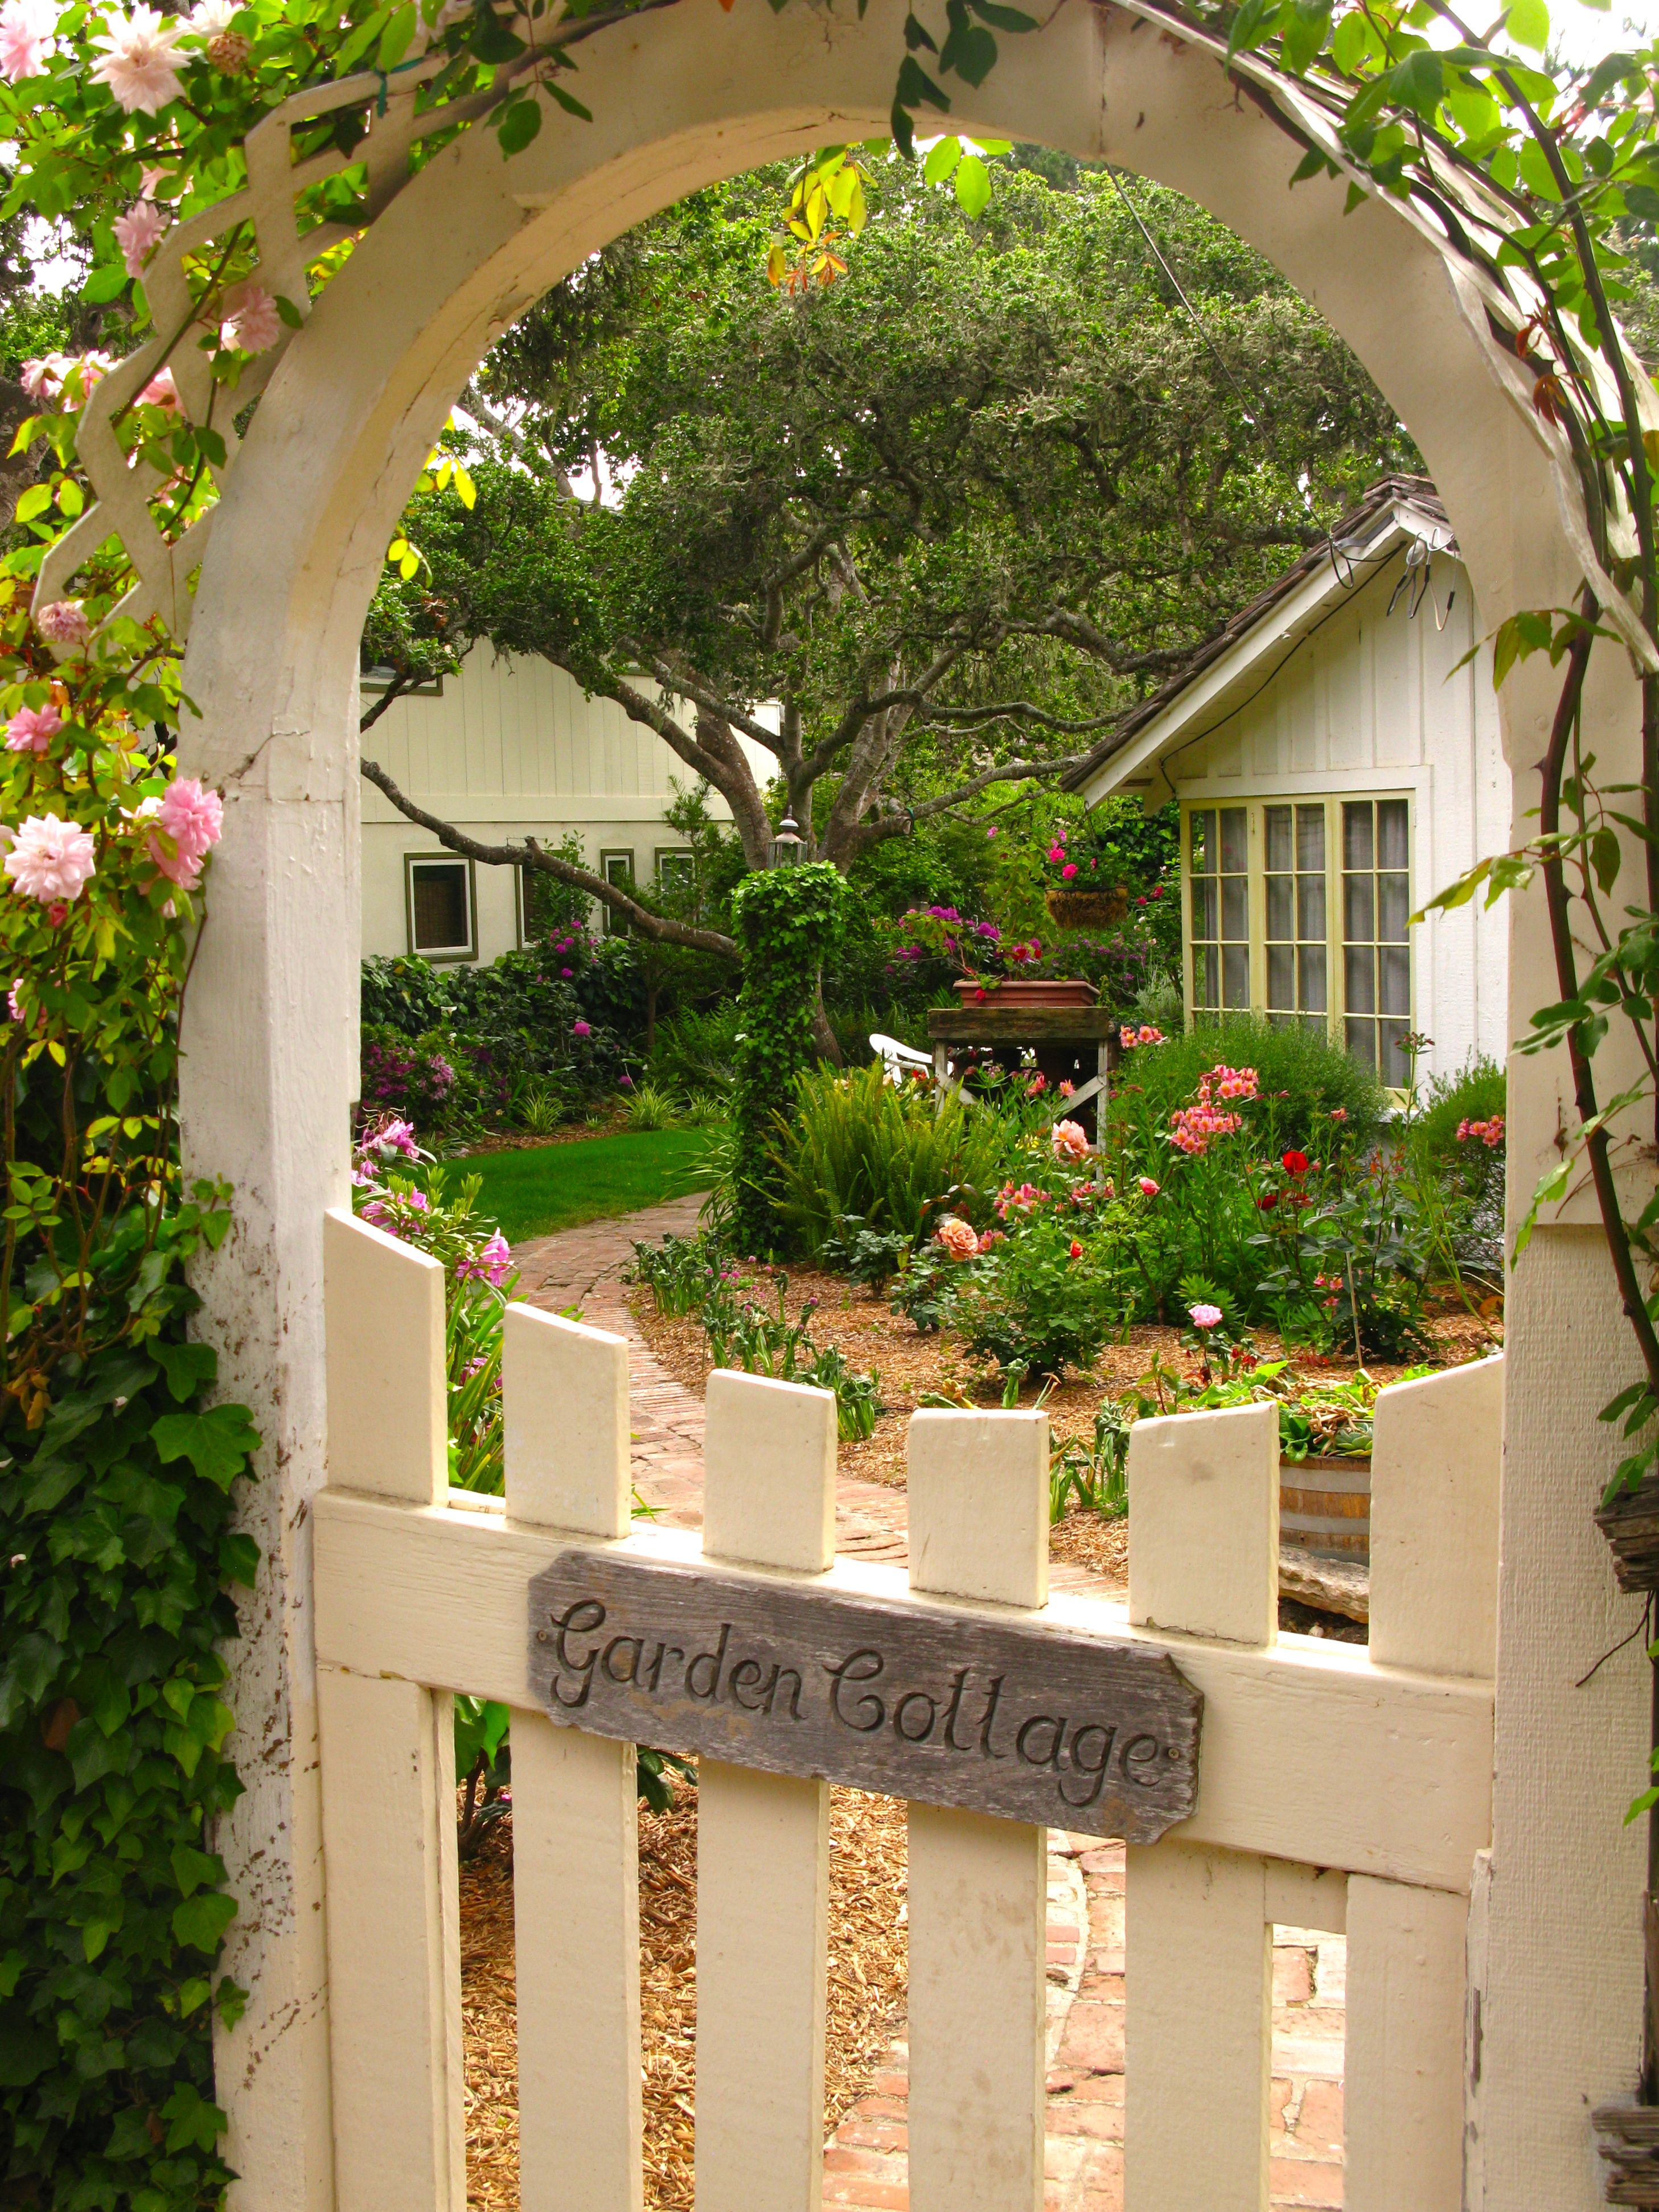 My Dream Home Interior Design Download: My Dream Home, Dream Garden And Dream